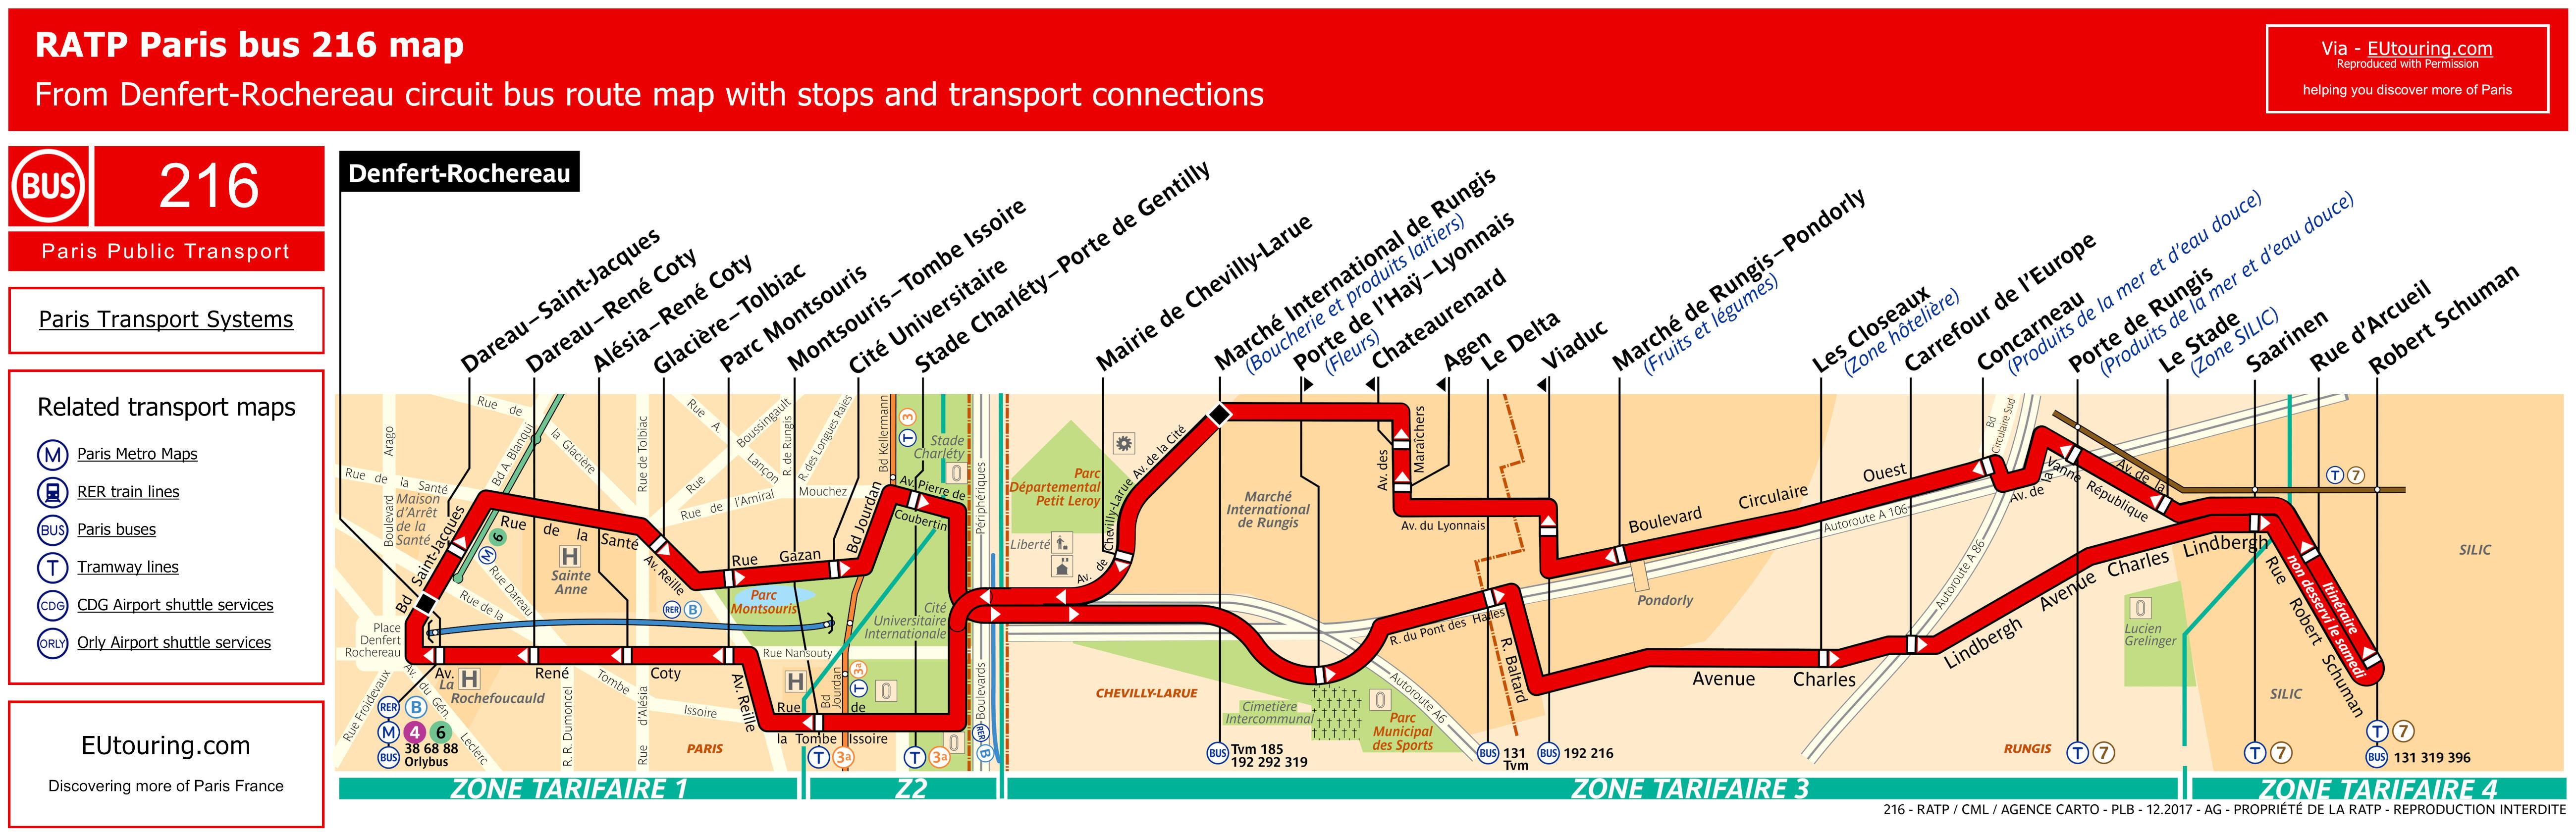 Ratp Route Maps For Paris Bus Lines 210 Through To 219